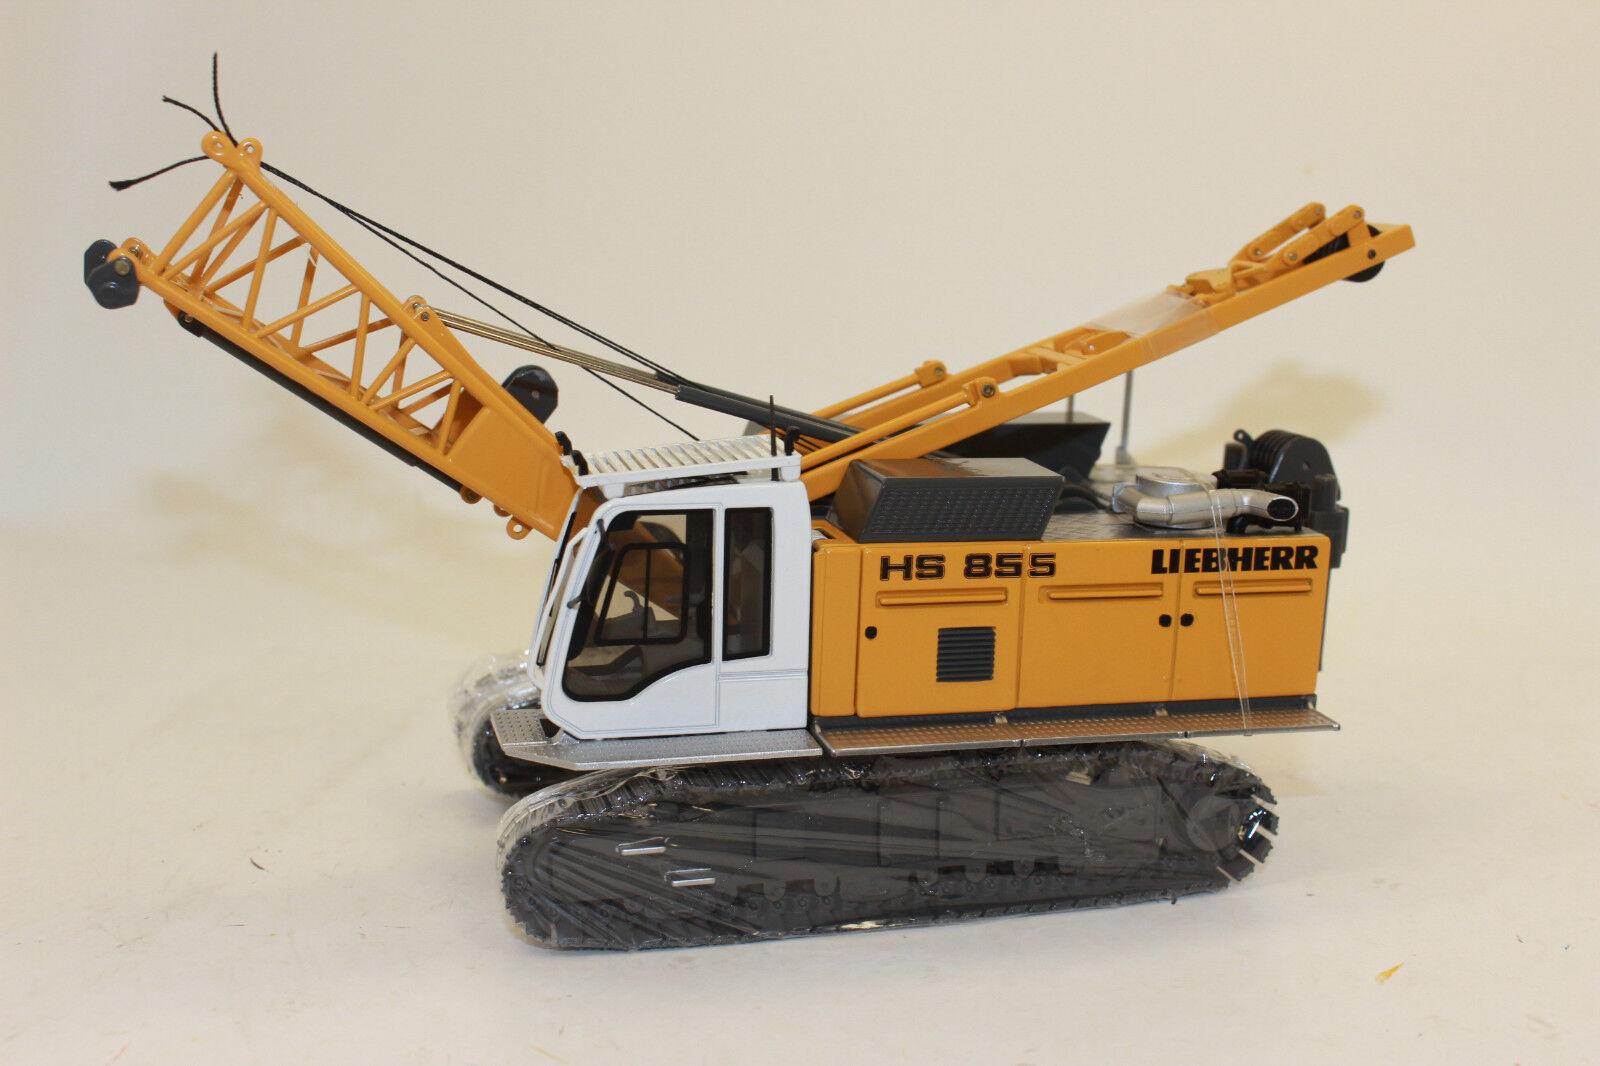 NZG 728 Liebherr HS 855 HYDRO Crawler Crane 1 50 NEW BOXED